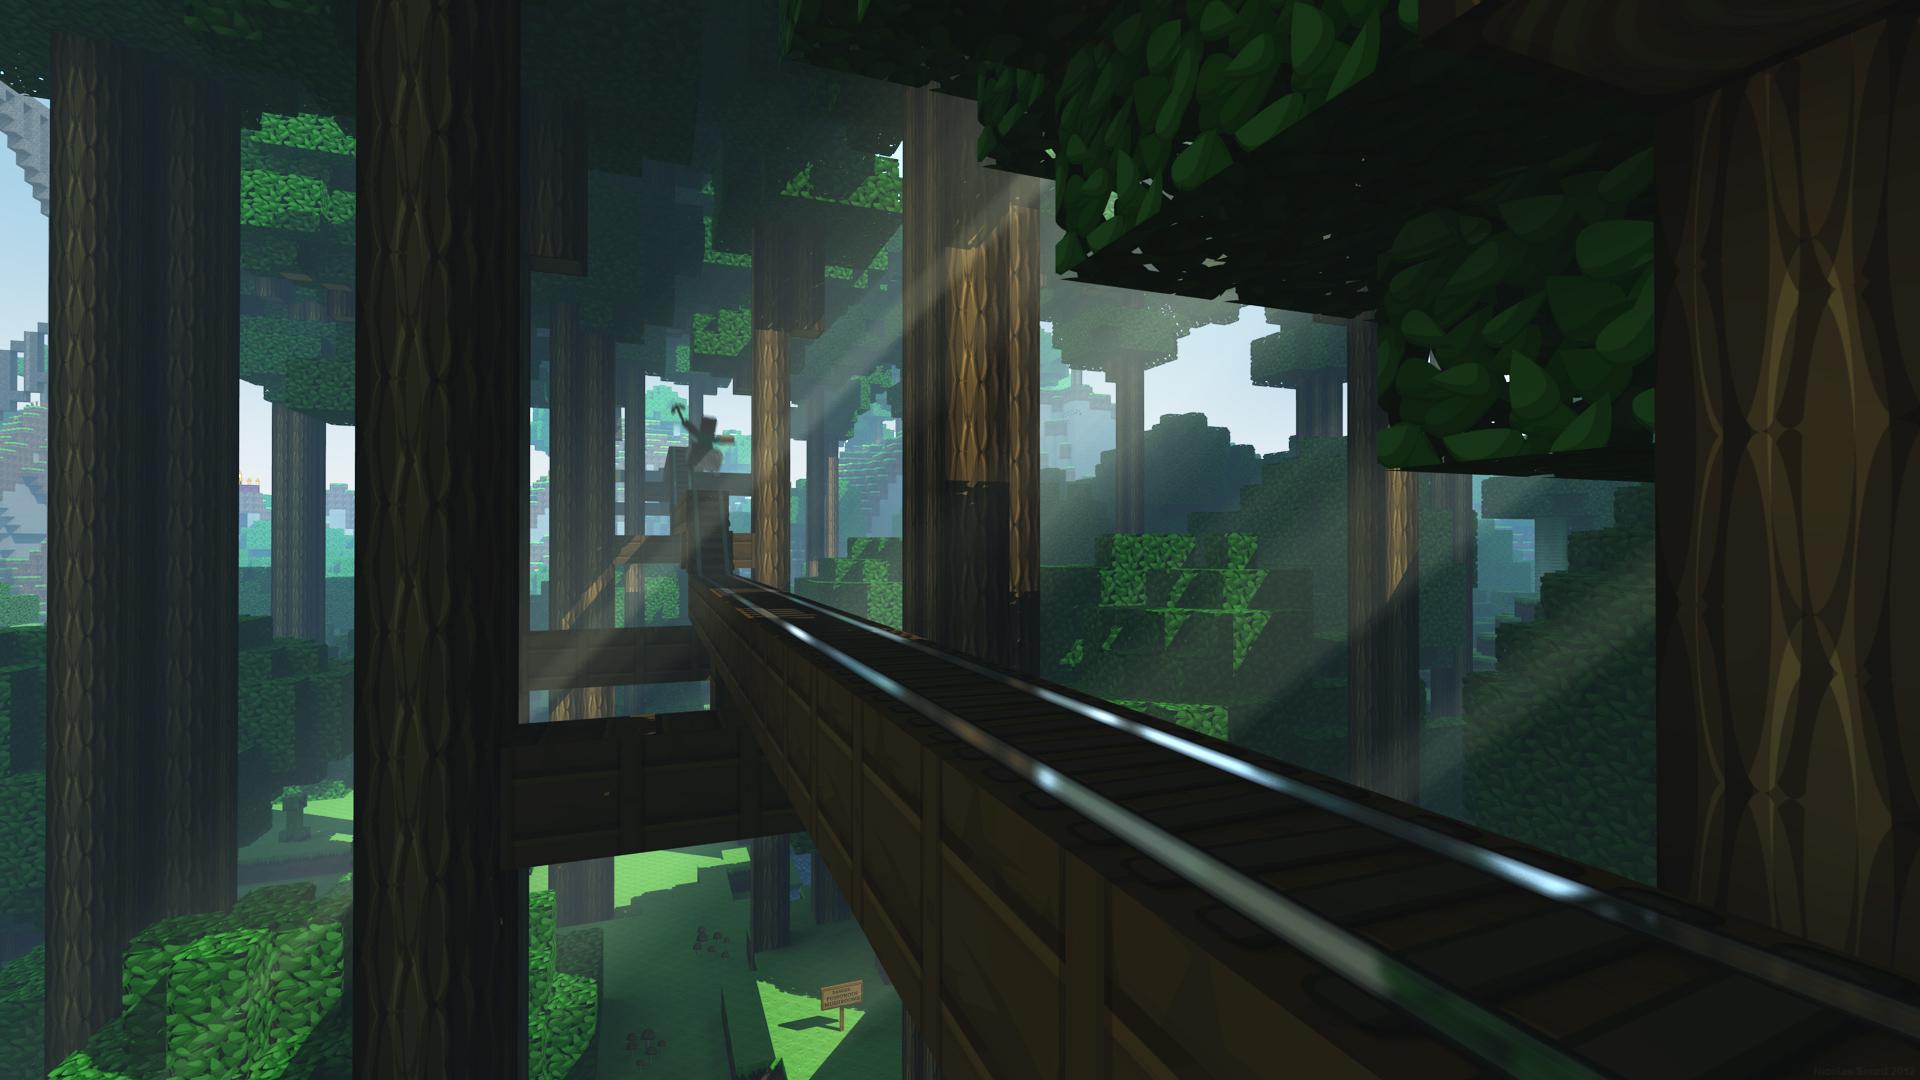 Minecraft Fondo De Pantalla Hd: 16 HD Minecraft Wallpapers